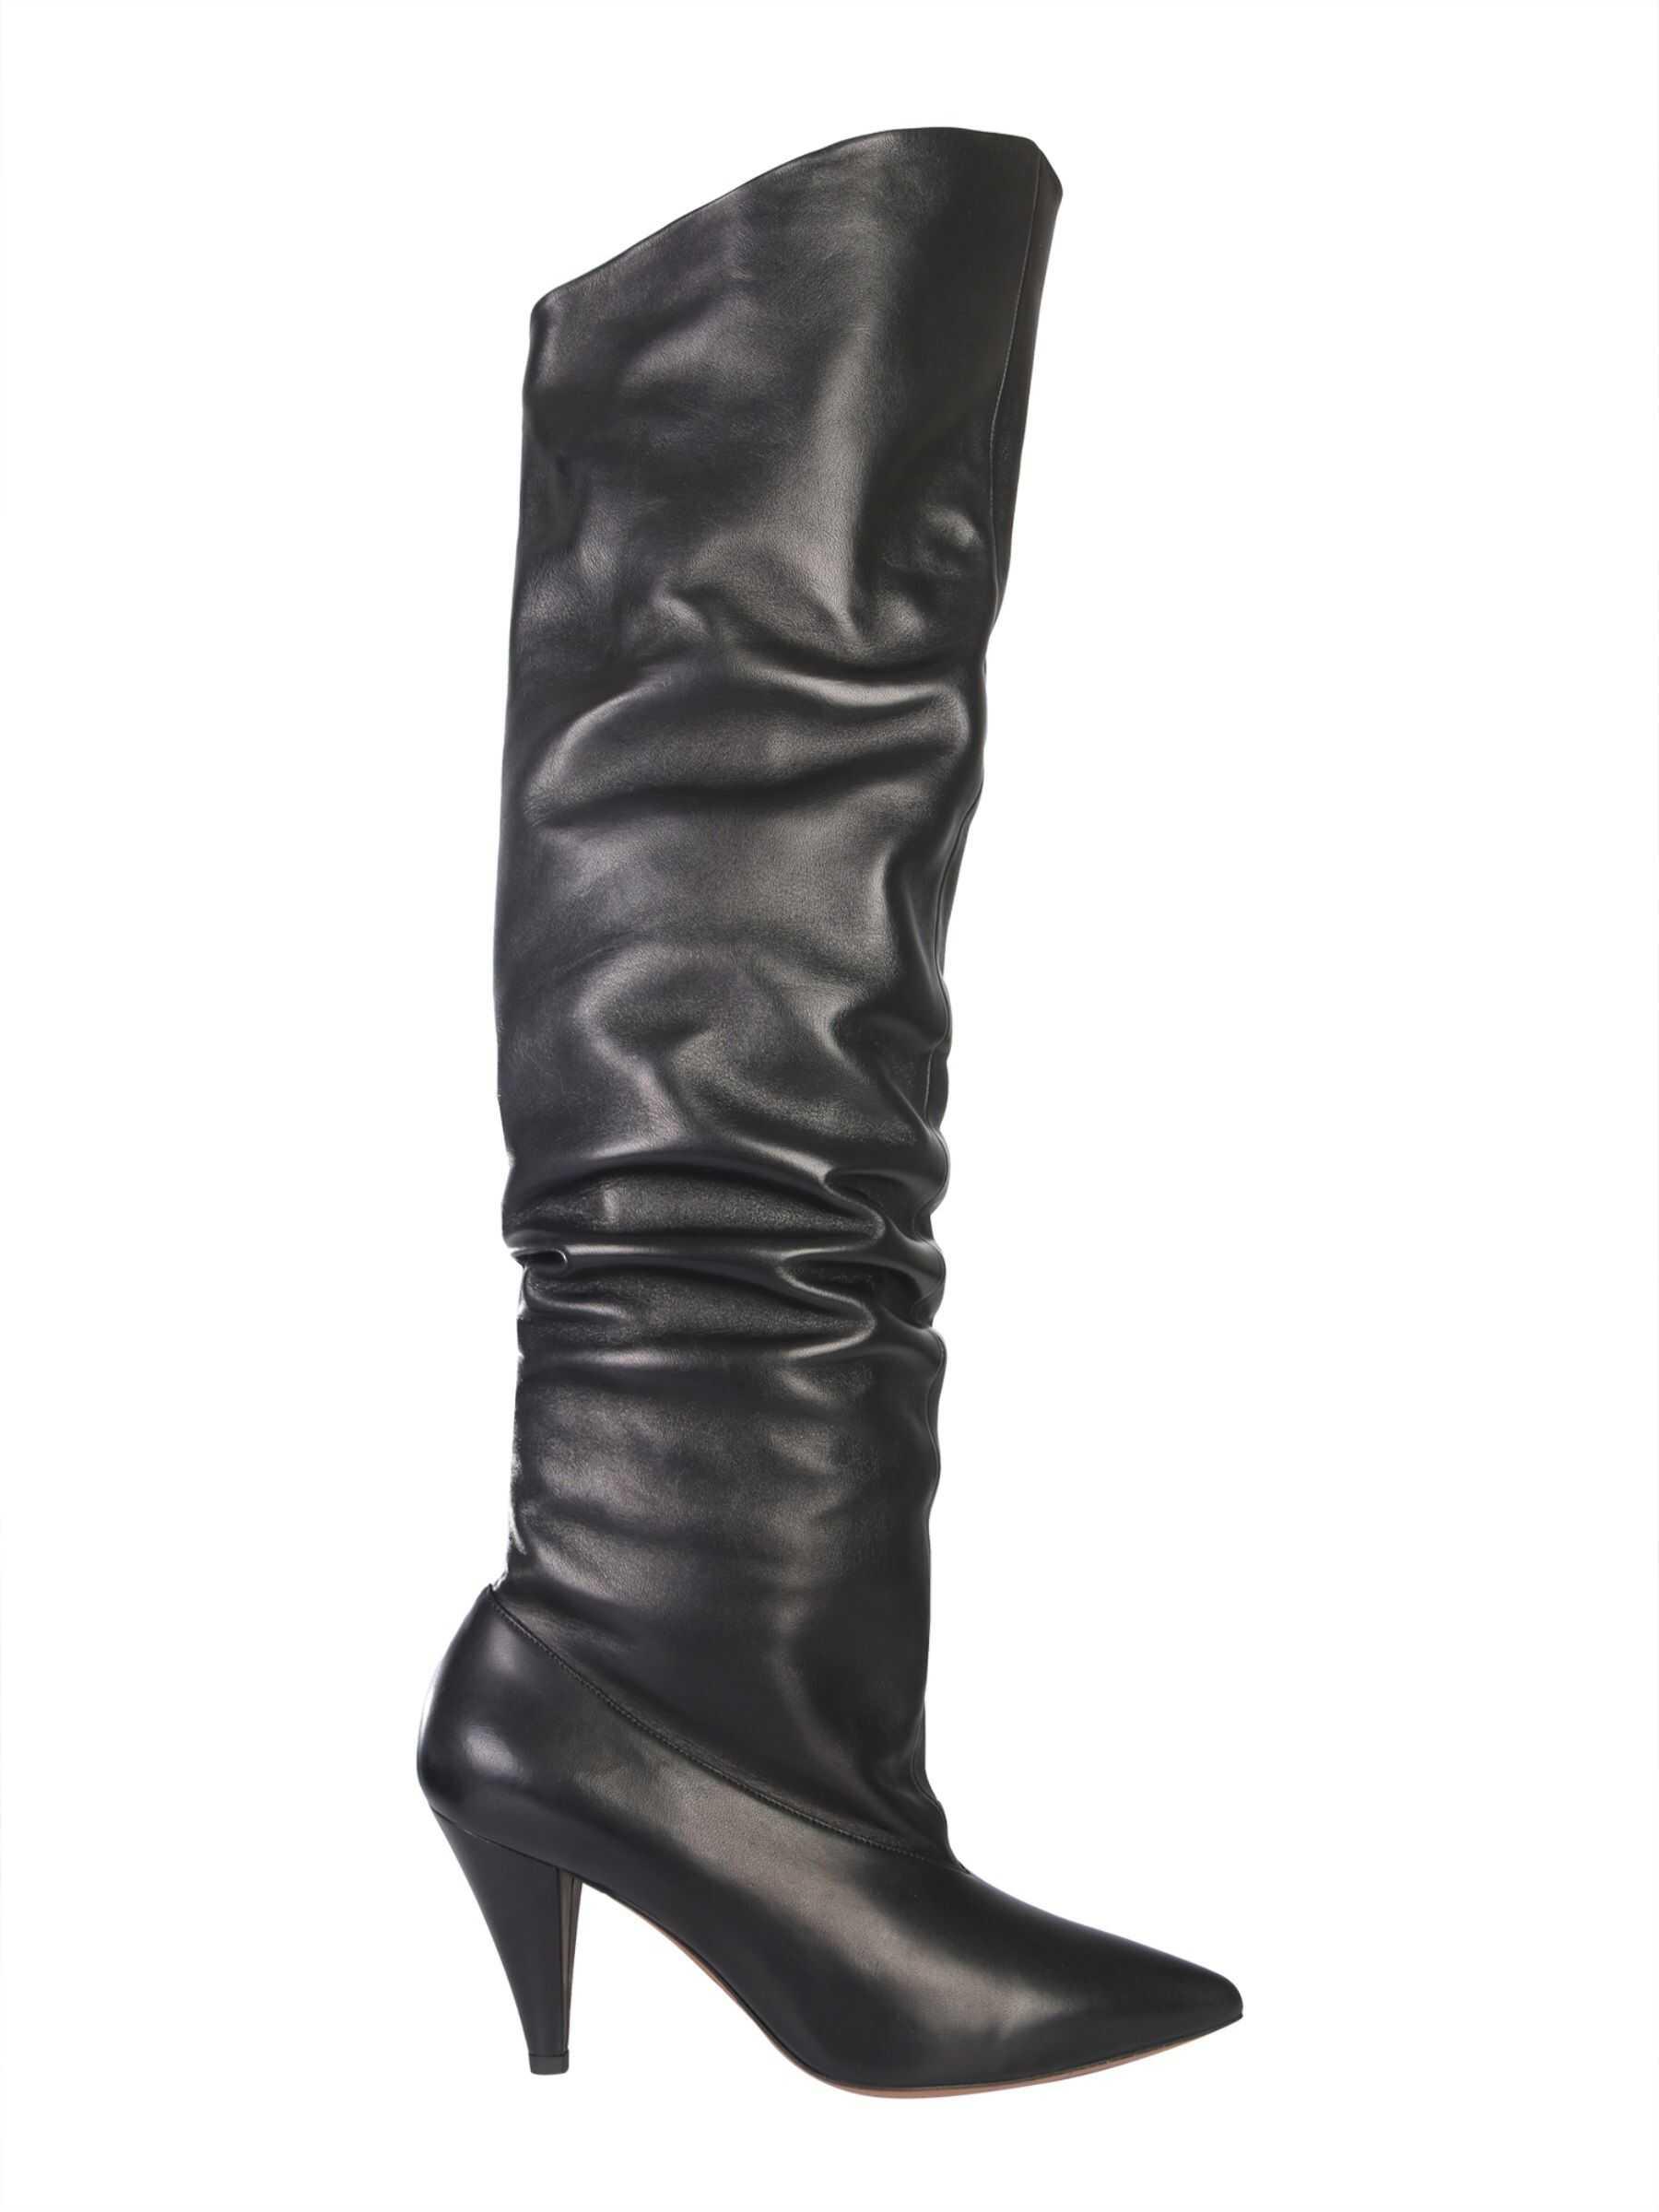 Givenchy Nappa Boots BE700S_E00H001 BLACK imagine b-mall.ro